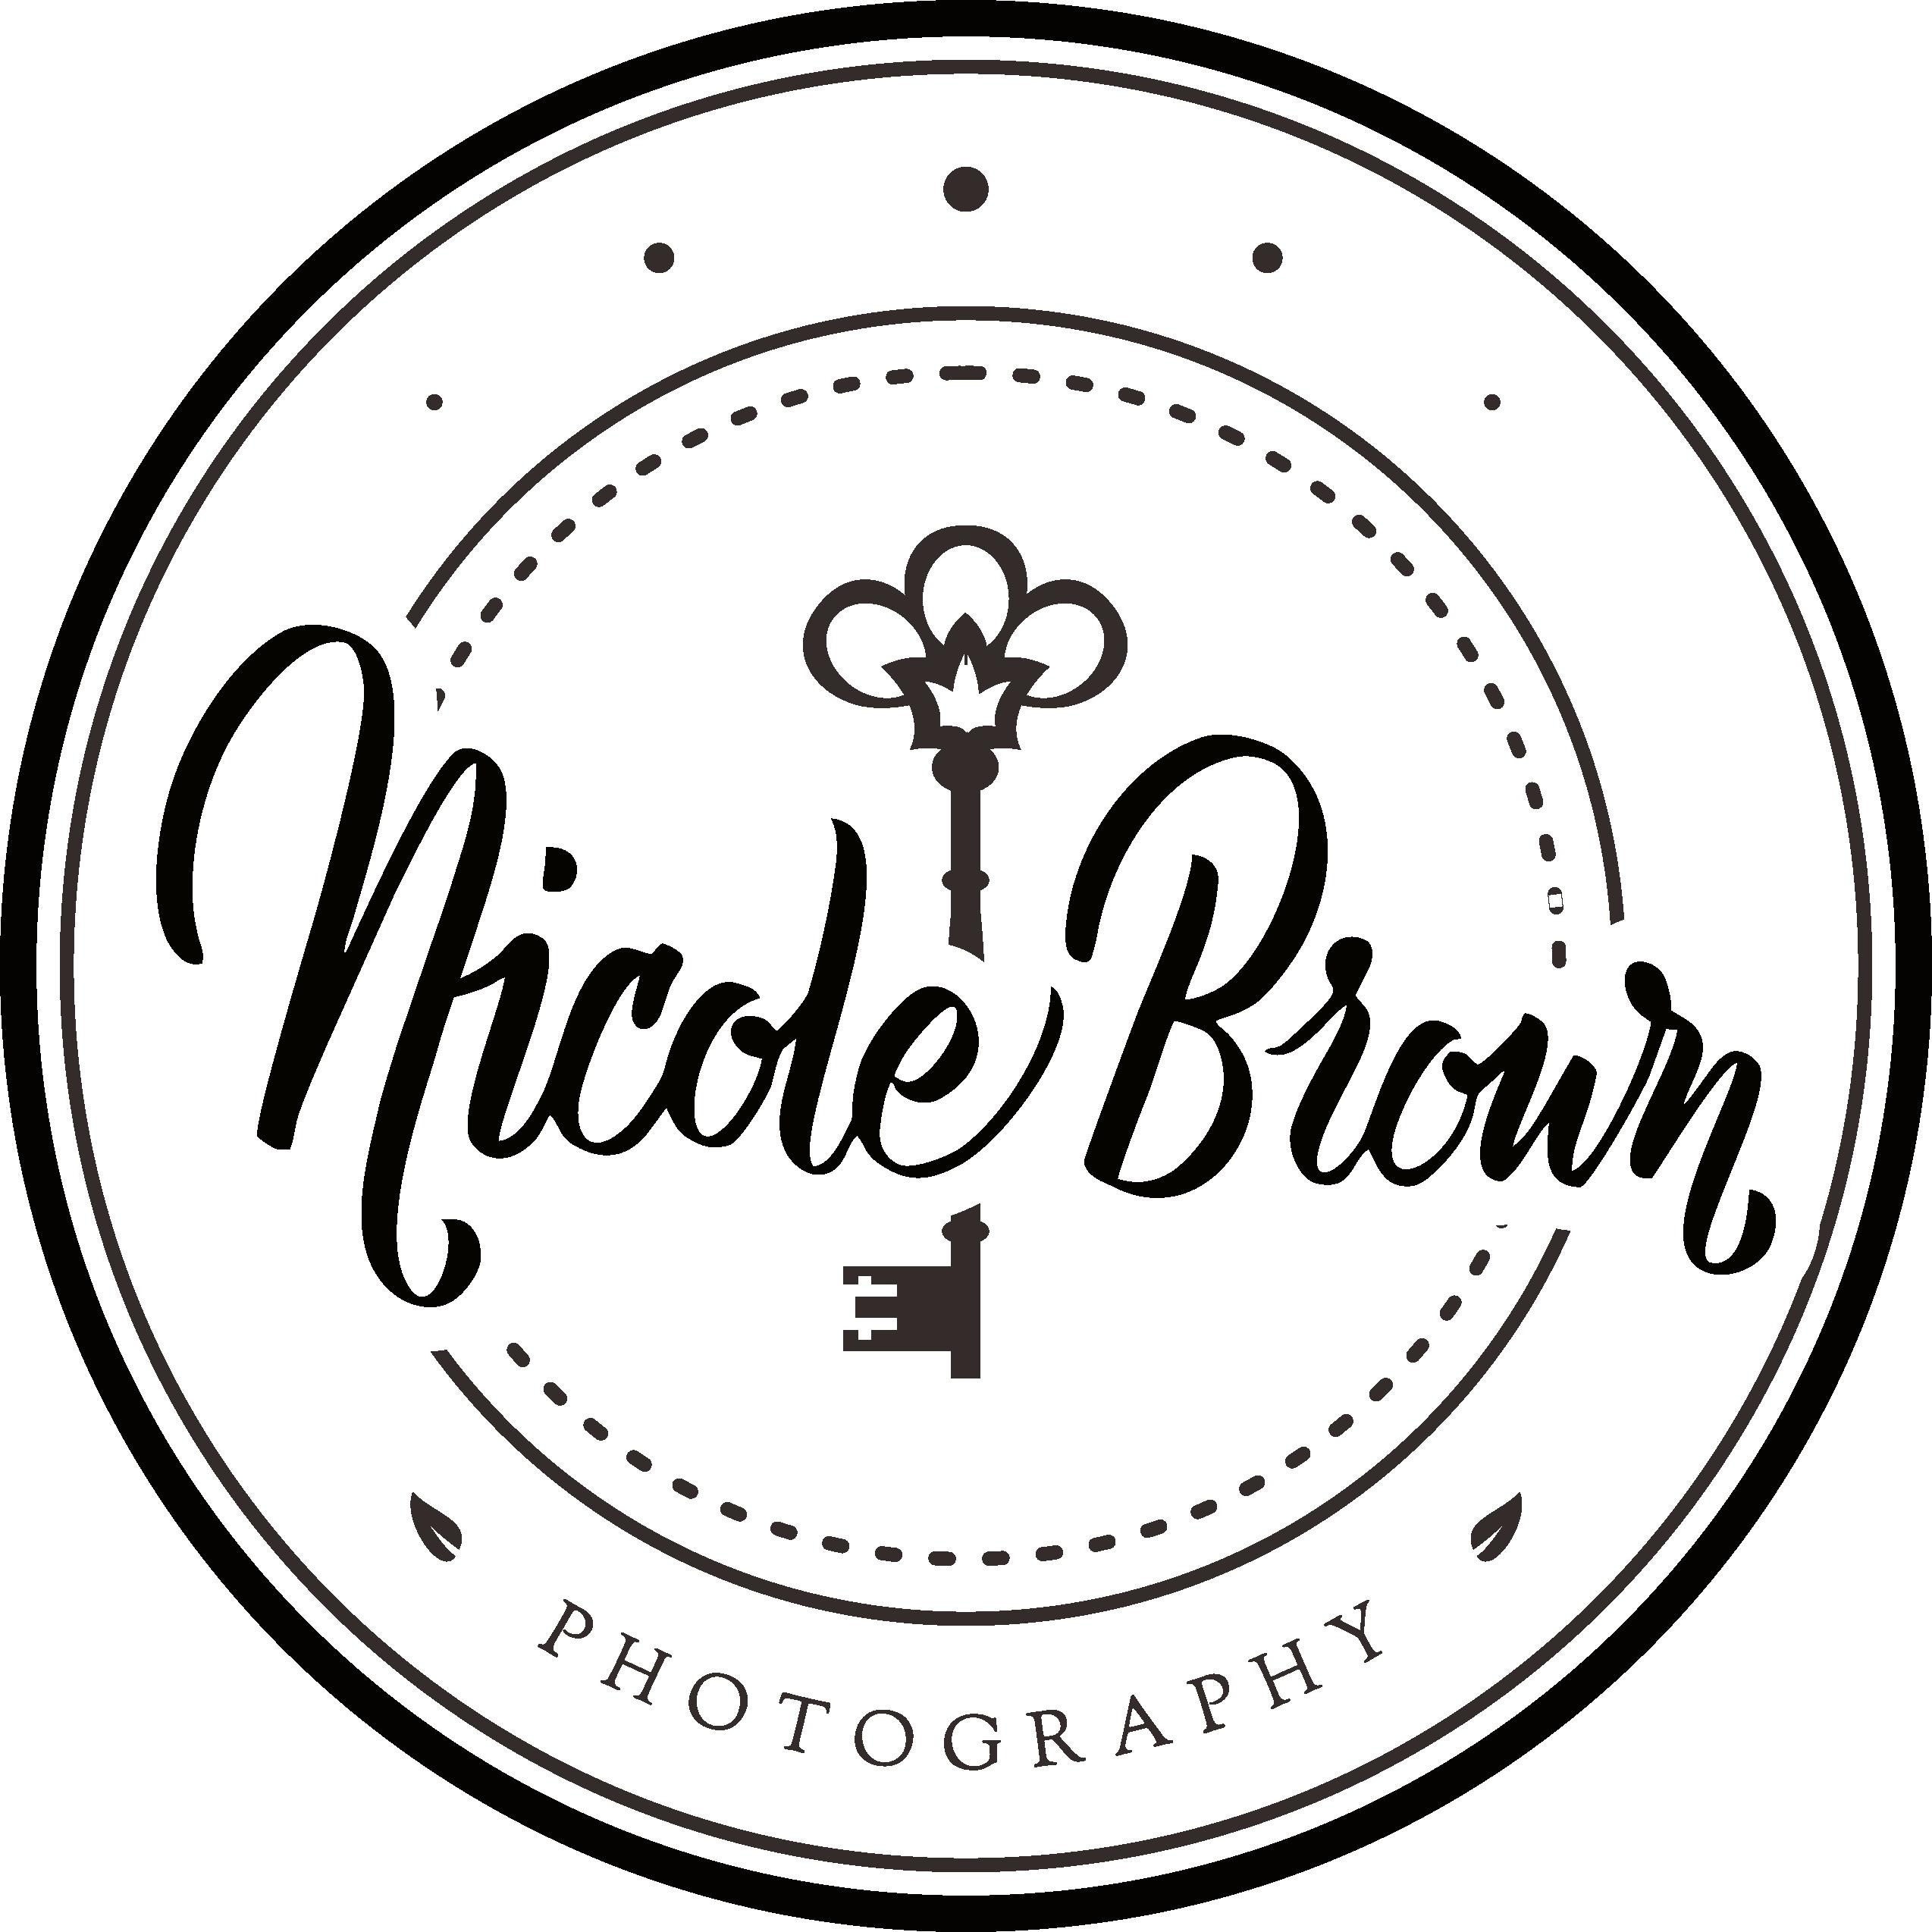 Create a vintage/elegant logo for a wedding and portrait photographer.